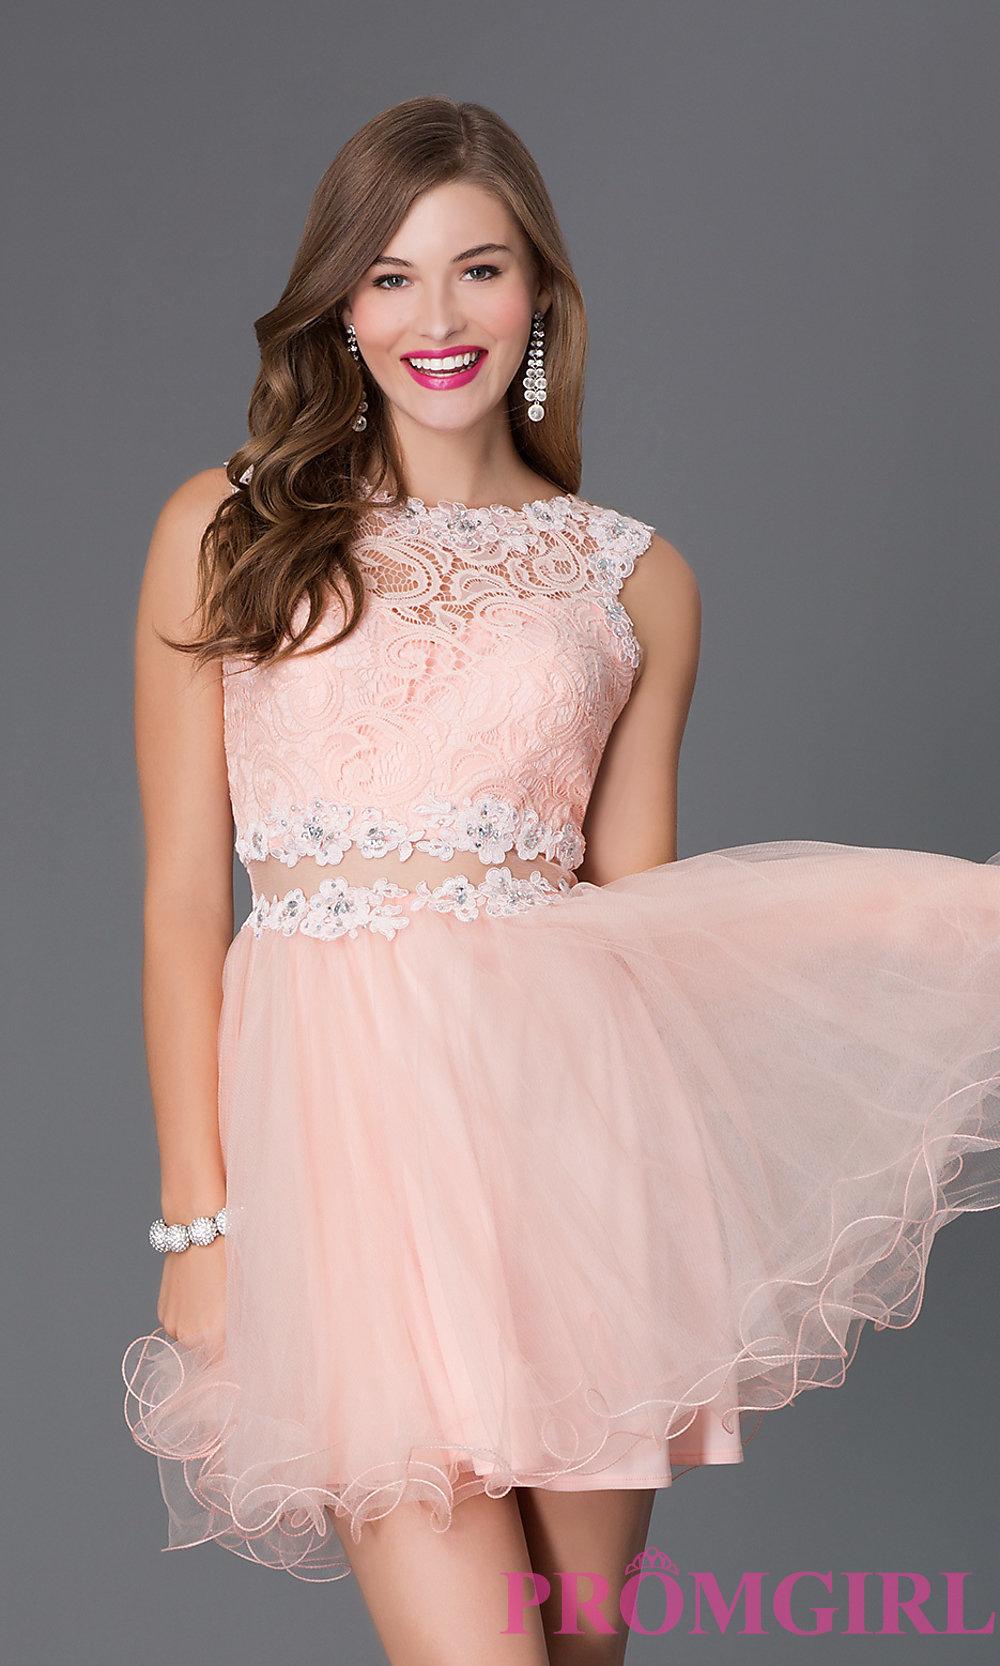 Lingerie Babydoll Dress | Babydoll Dresses | Maternity Babydoll Dresses